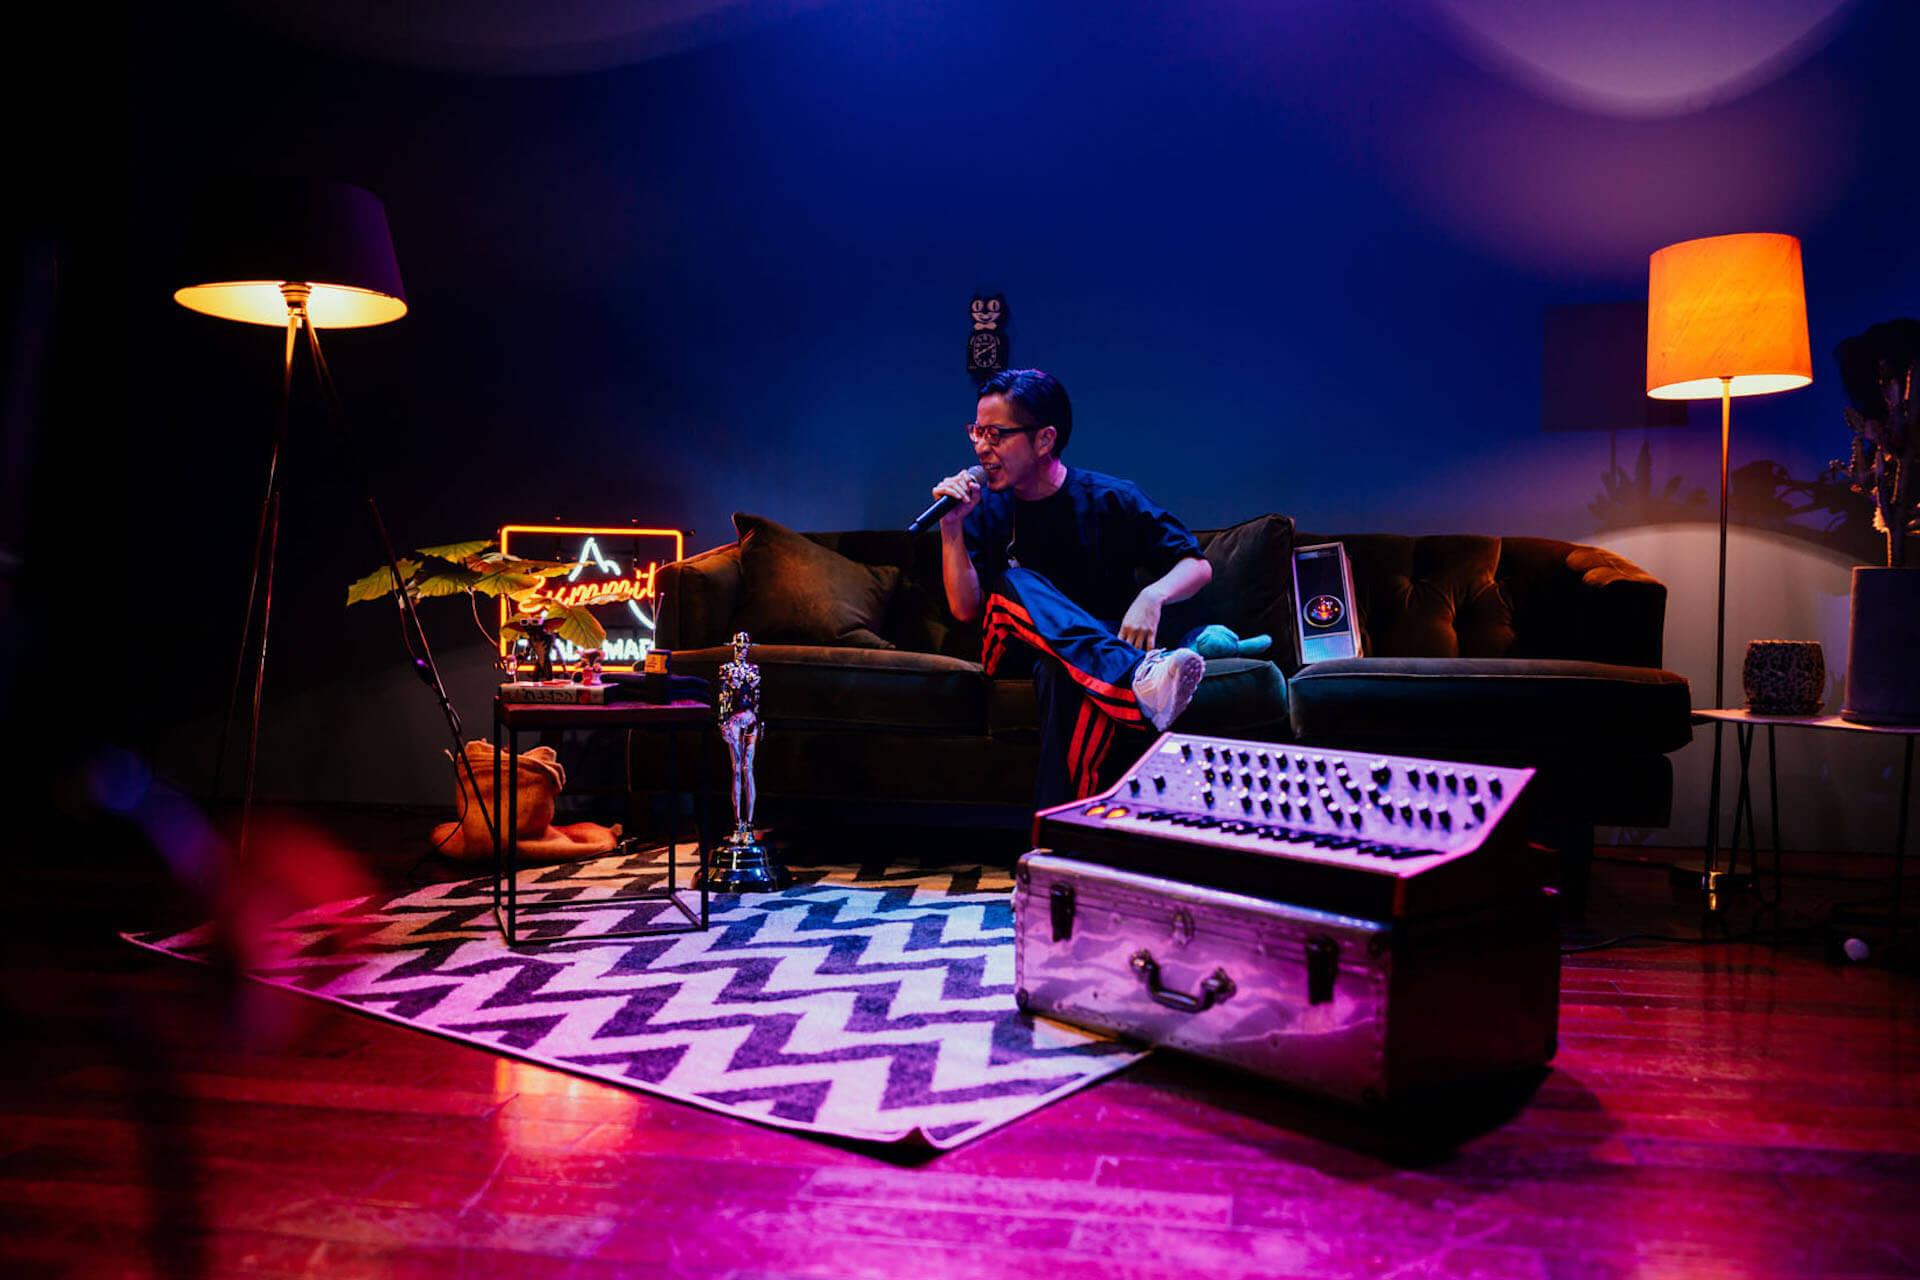 PUNPEEが生配信ライブ<PUNPEE Sofa Kingdomcom>を徹底解説!スペースシャワーTVにてディテールを語るトーク番組が放送決定 music201102_punpee_live_5